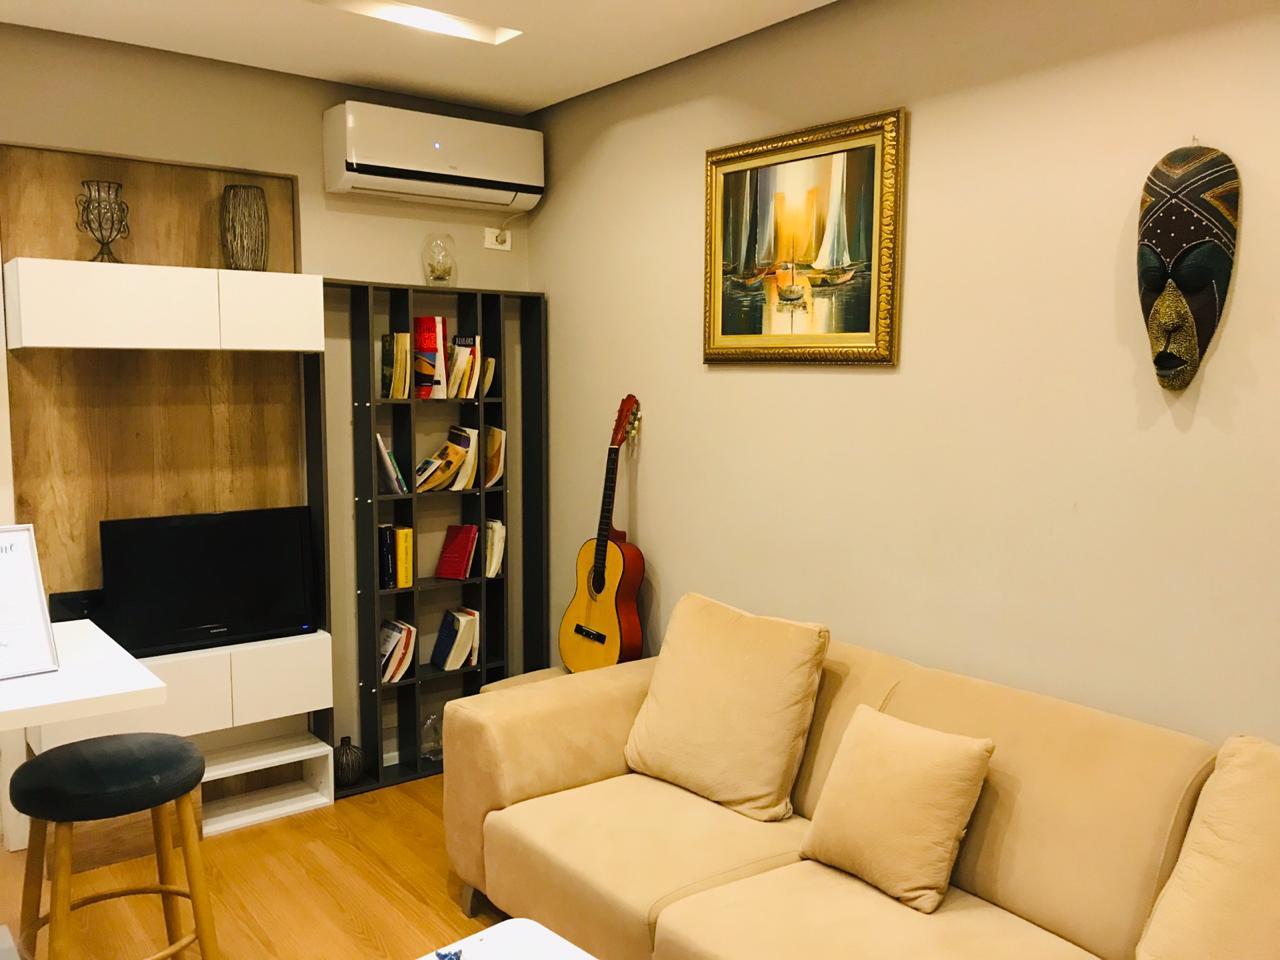 Apartamente me qera ditore prane sheshit Skenderbej